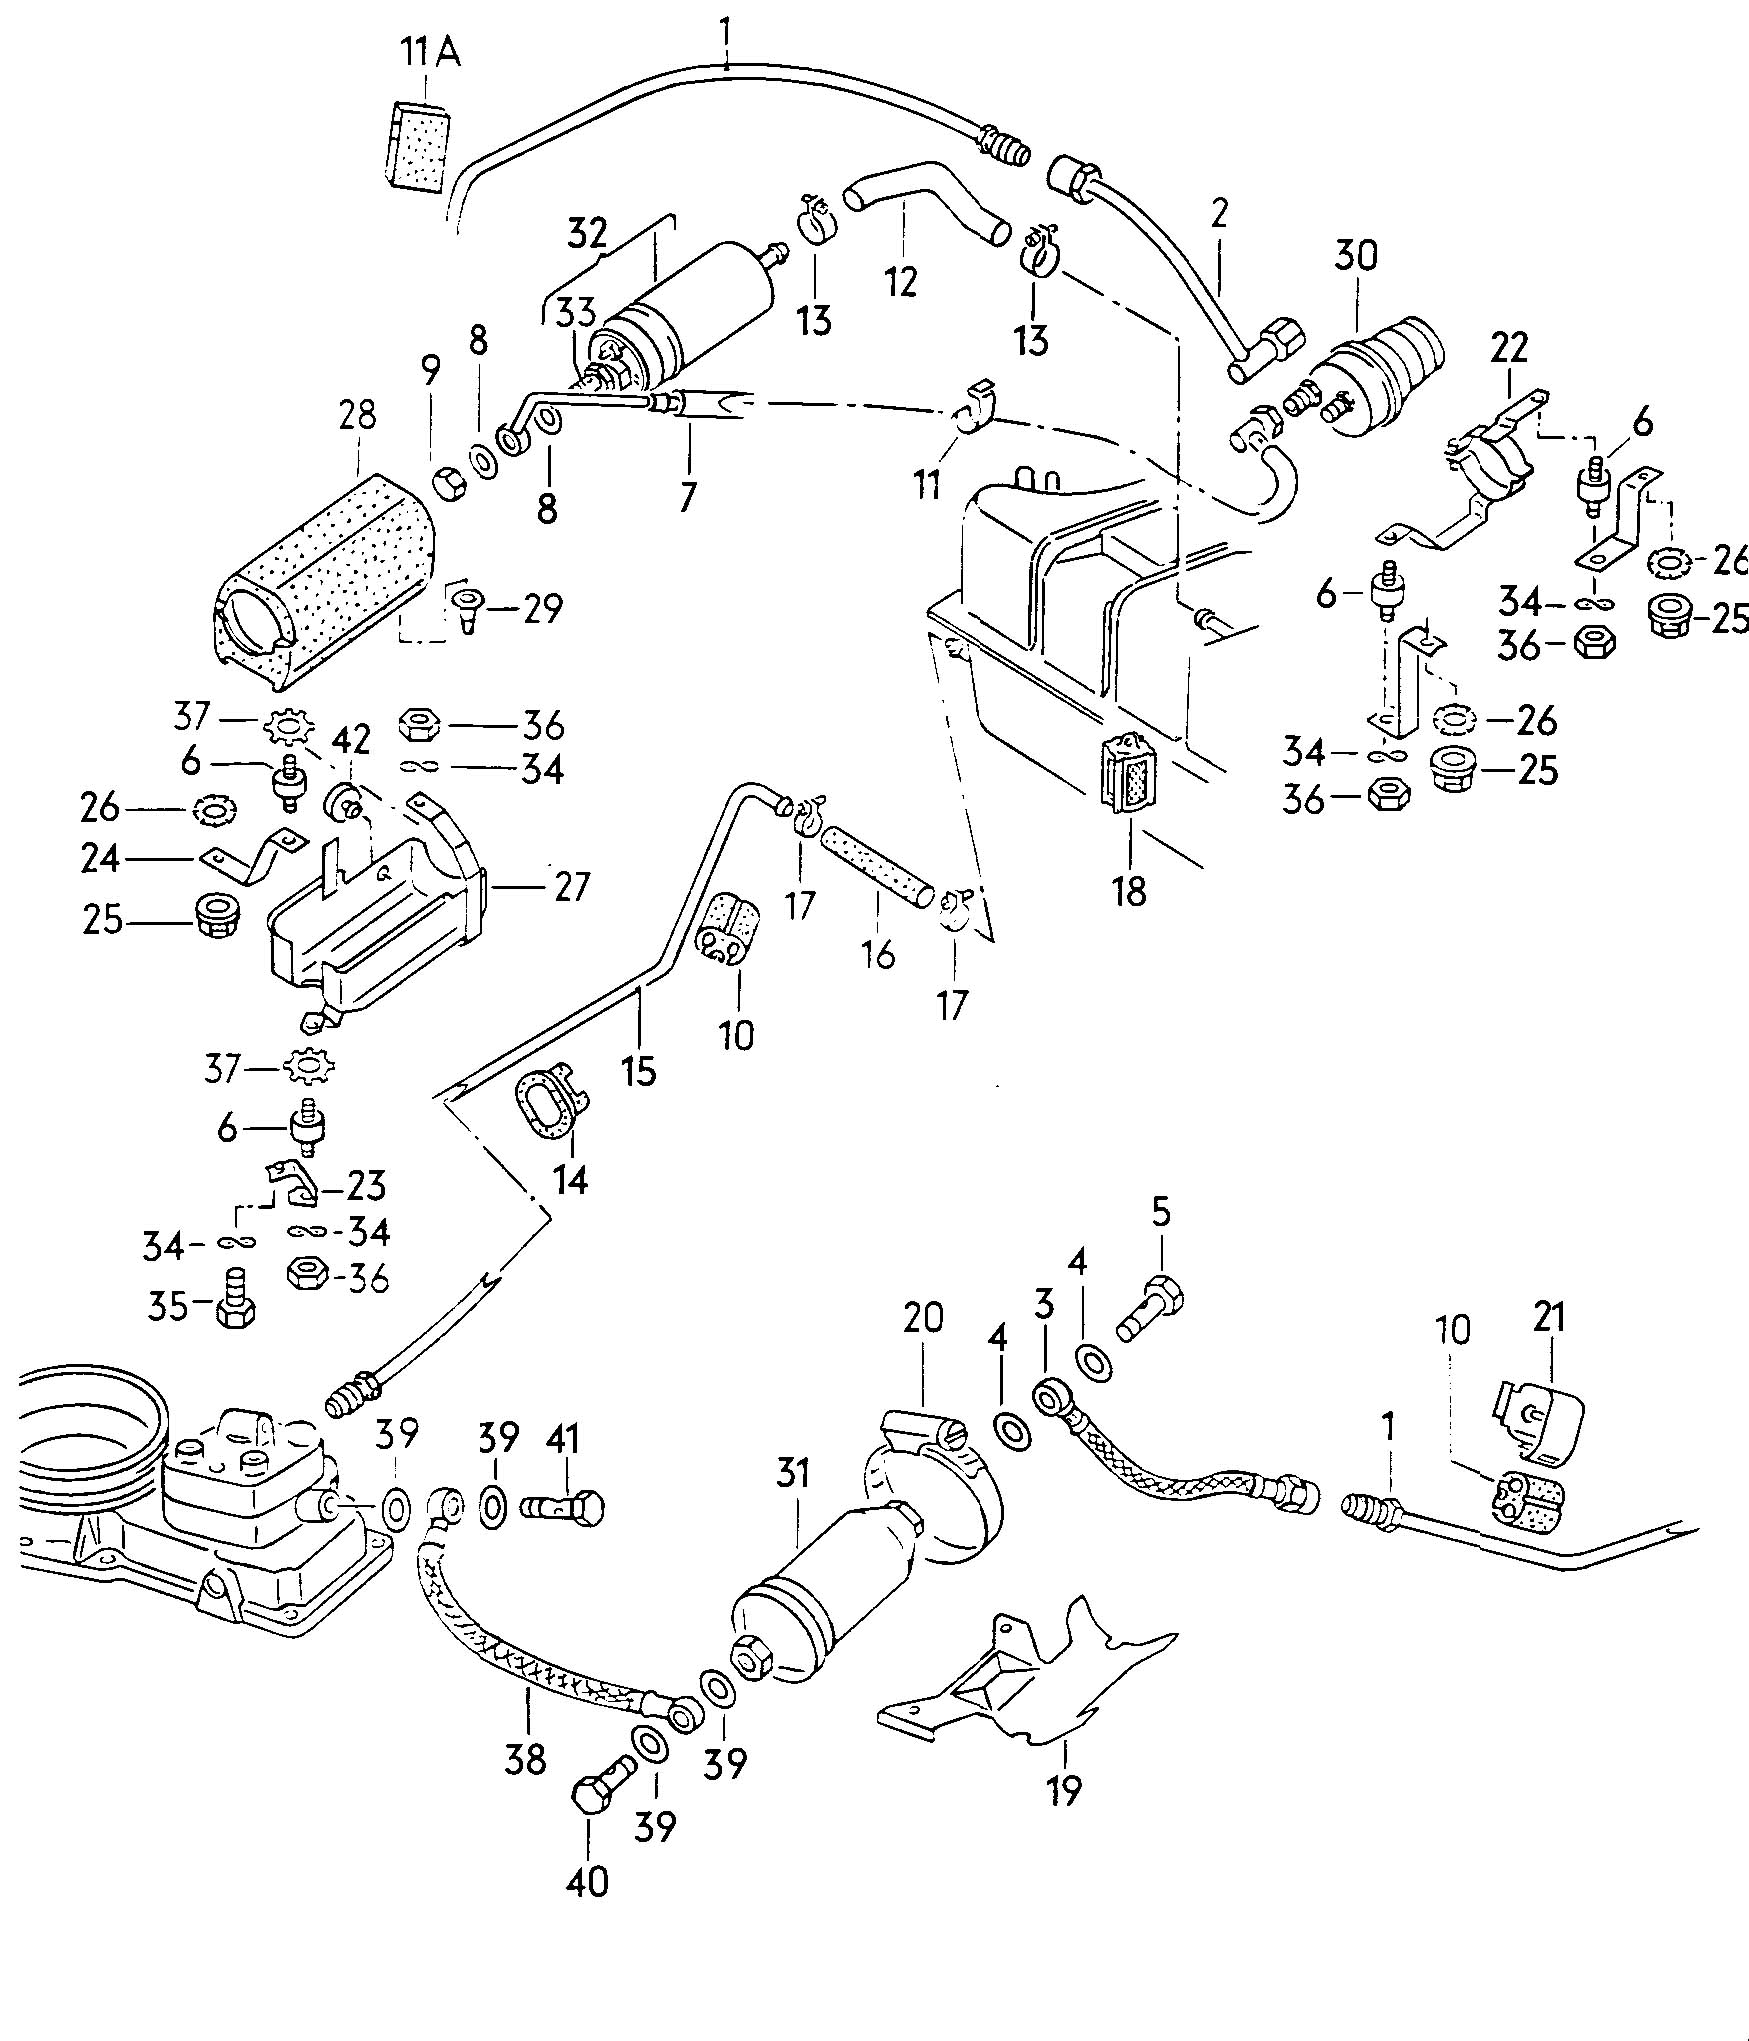 1988 volkswagen cabriolet fuel filter